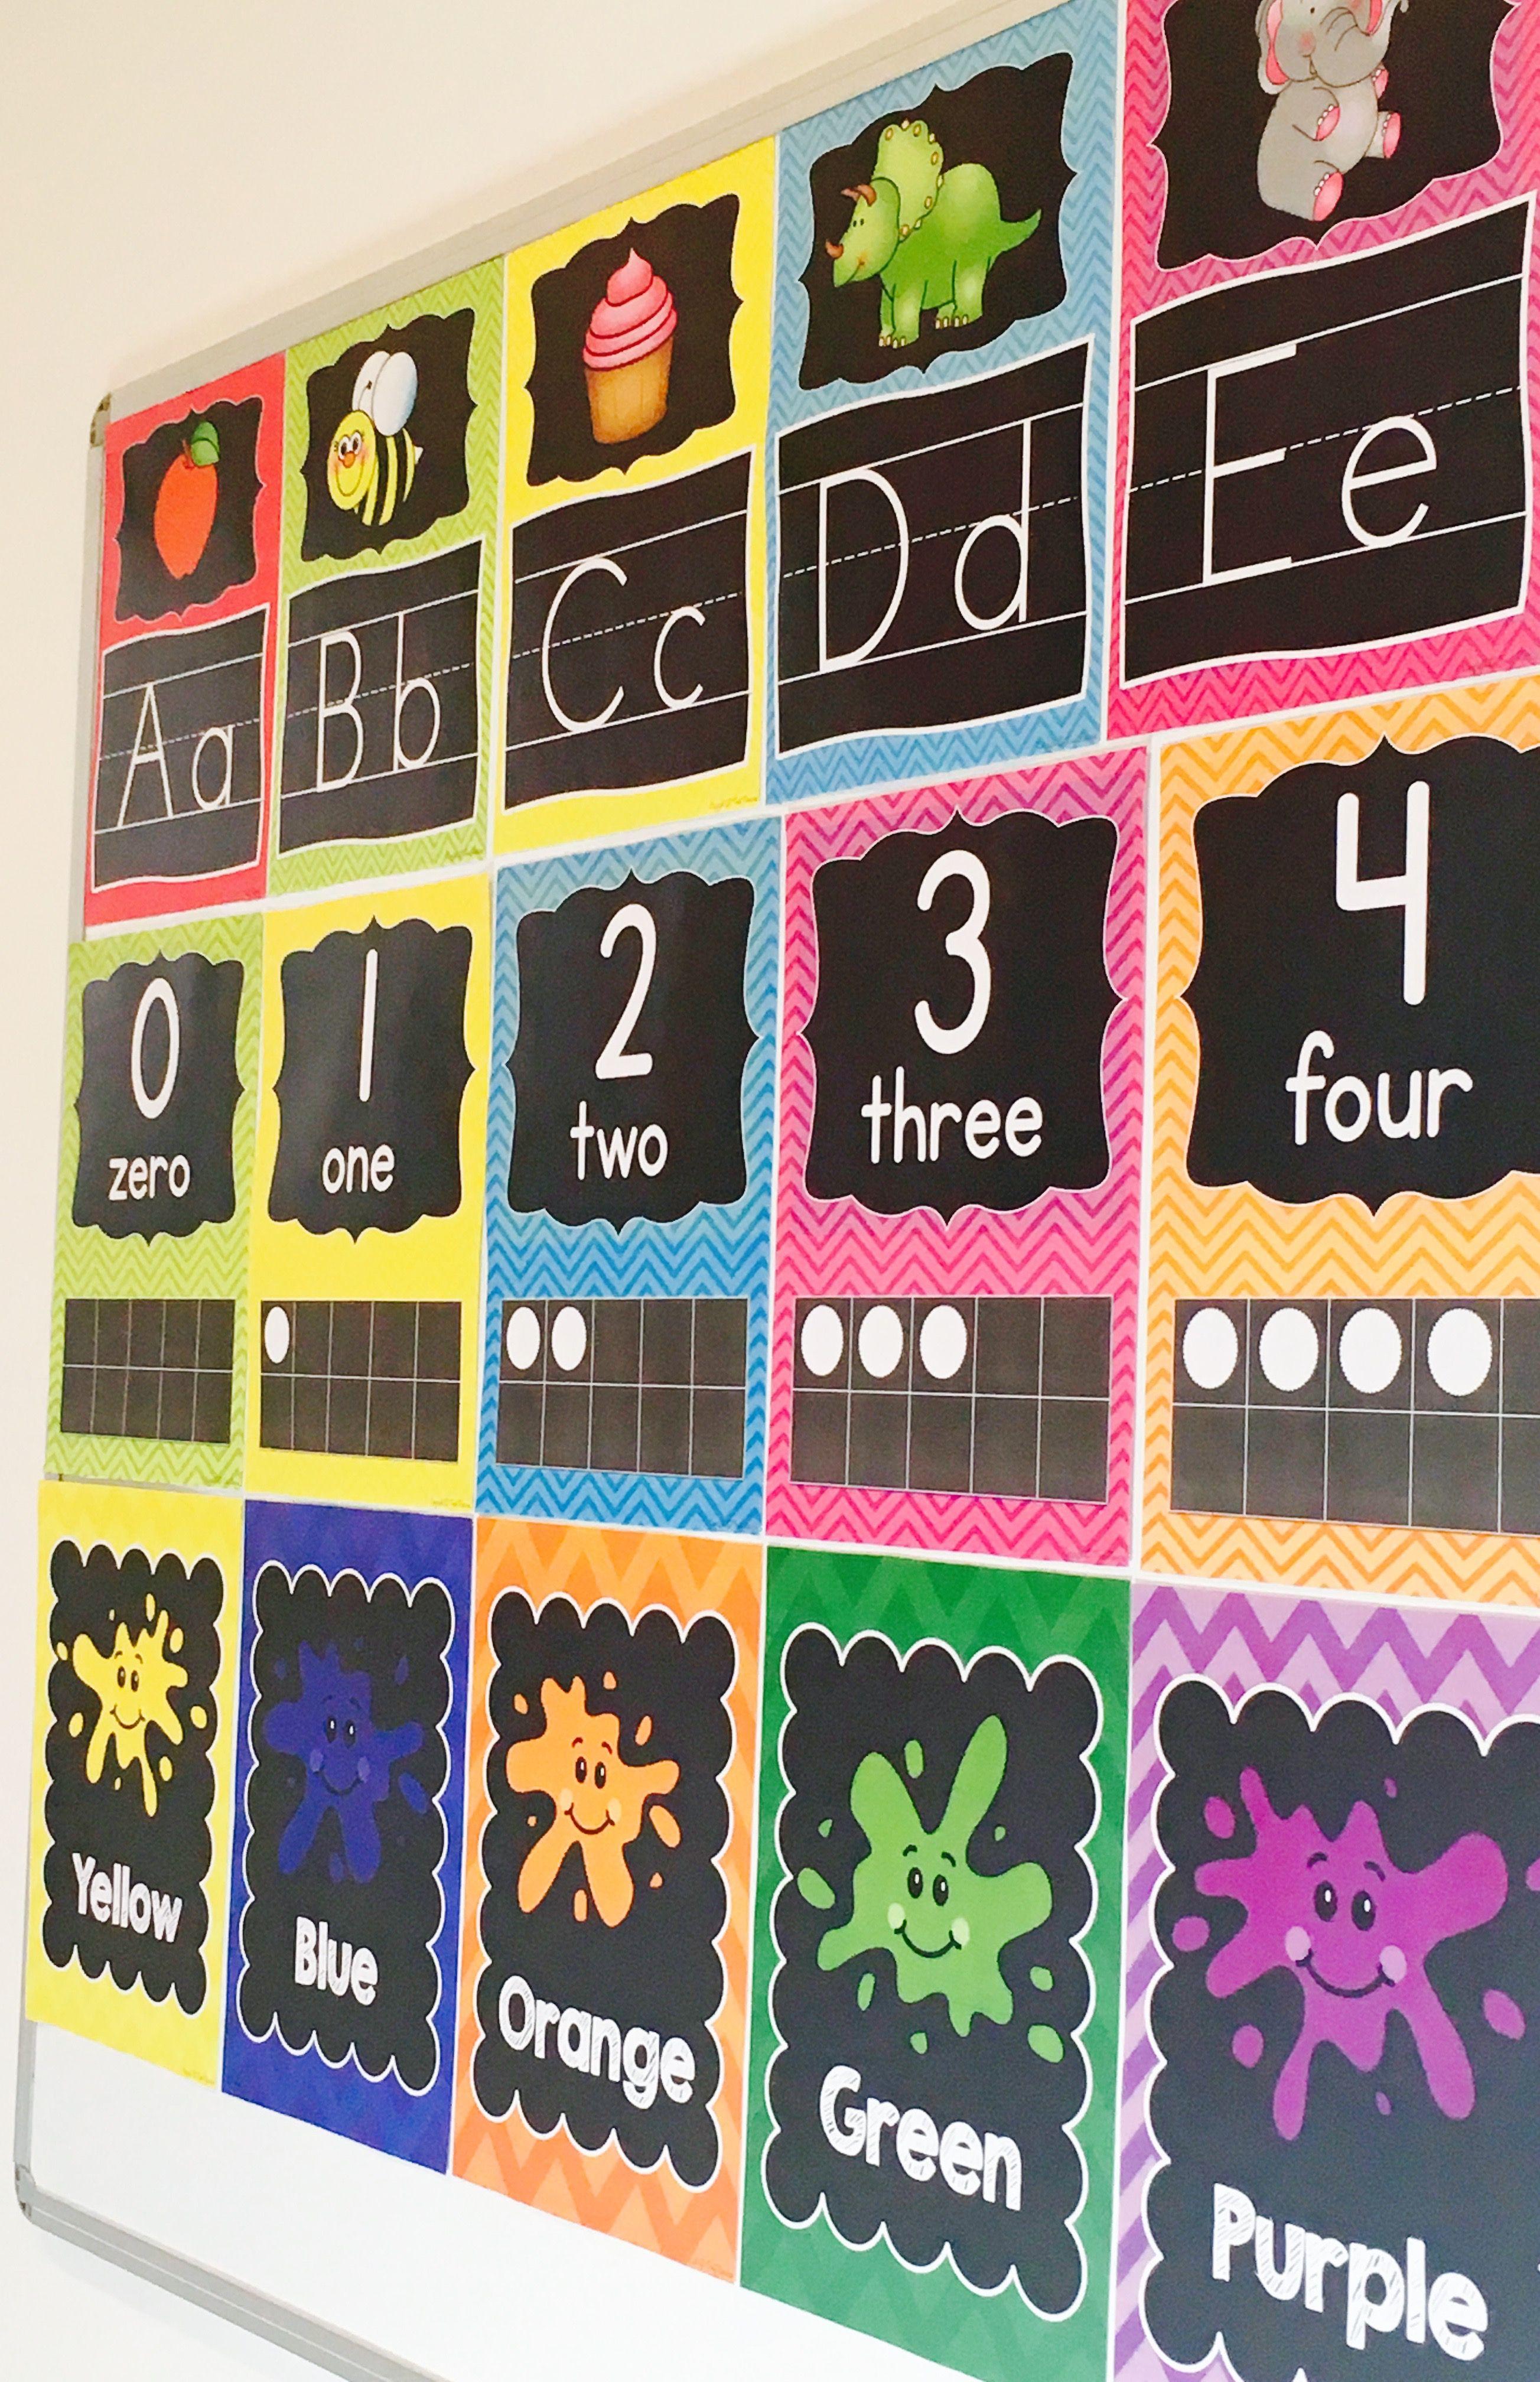 Chalkboard Chevron Classroom Theme Decor Bundle Jobs Rules